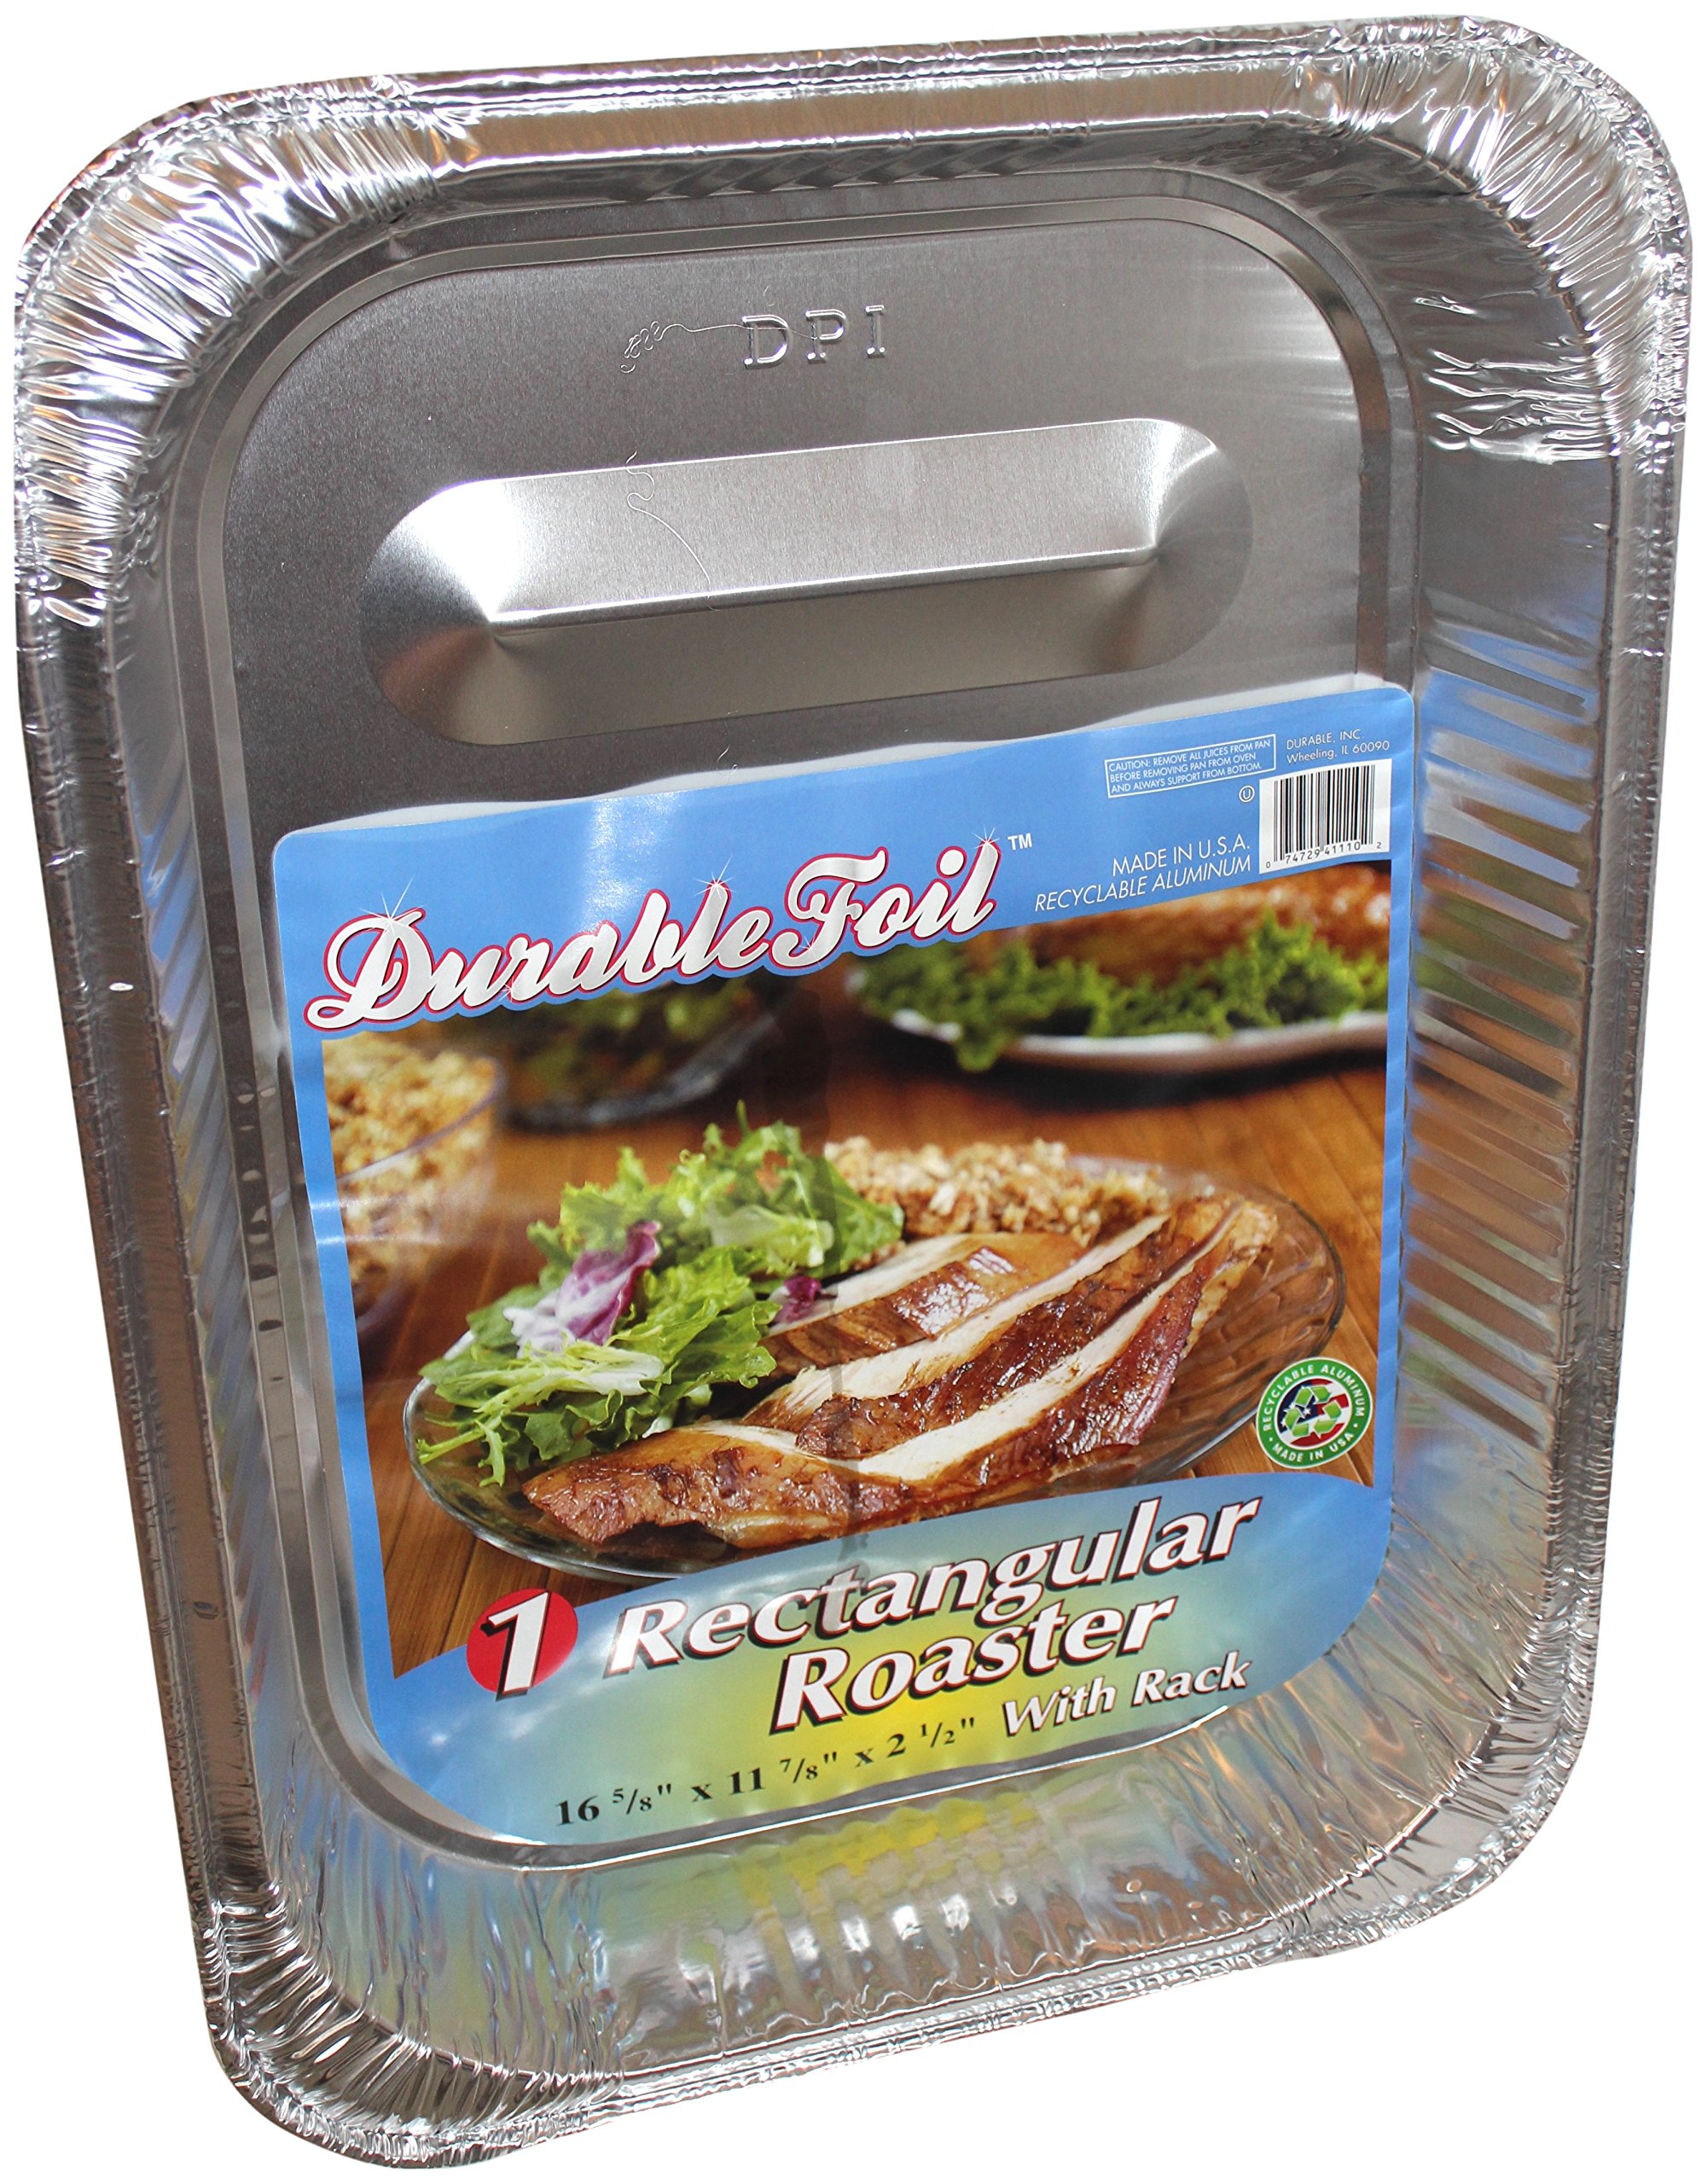 Durable Foil Rectangular Aluminum Roasting Pan, X-Large, 16 5/8'' x 11 7/8'' x 2 ½'' (Pack of 12)